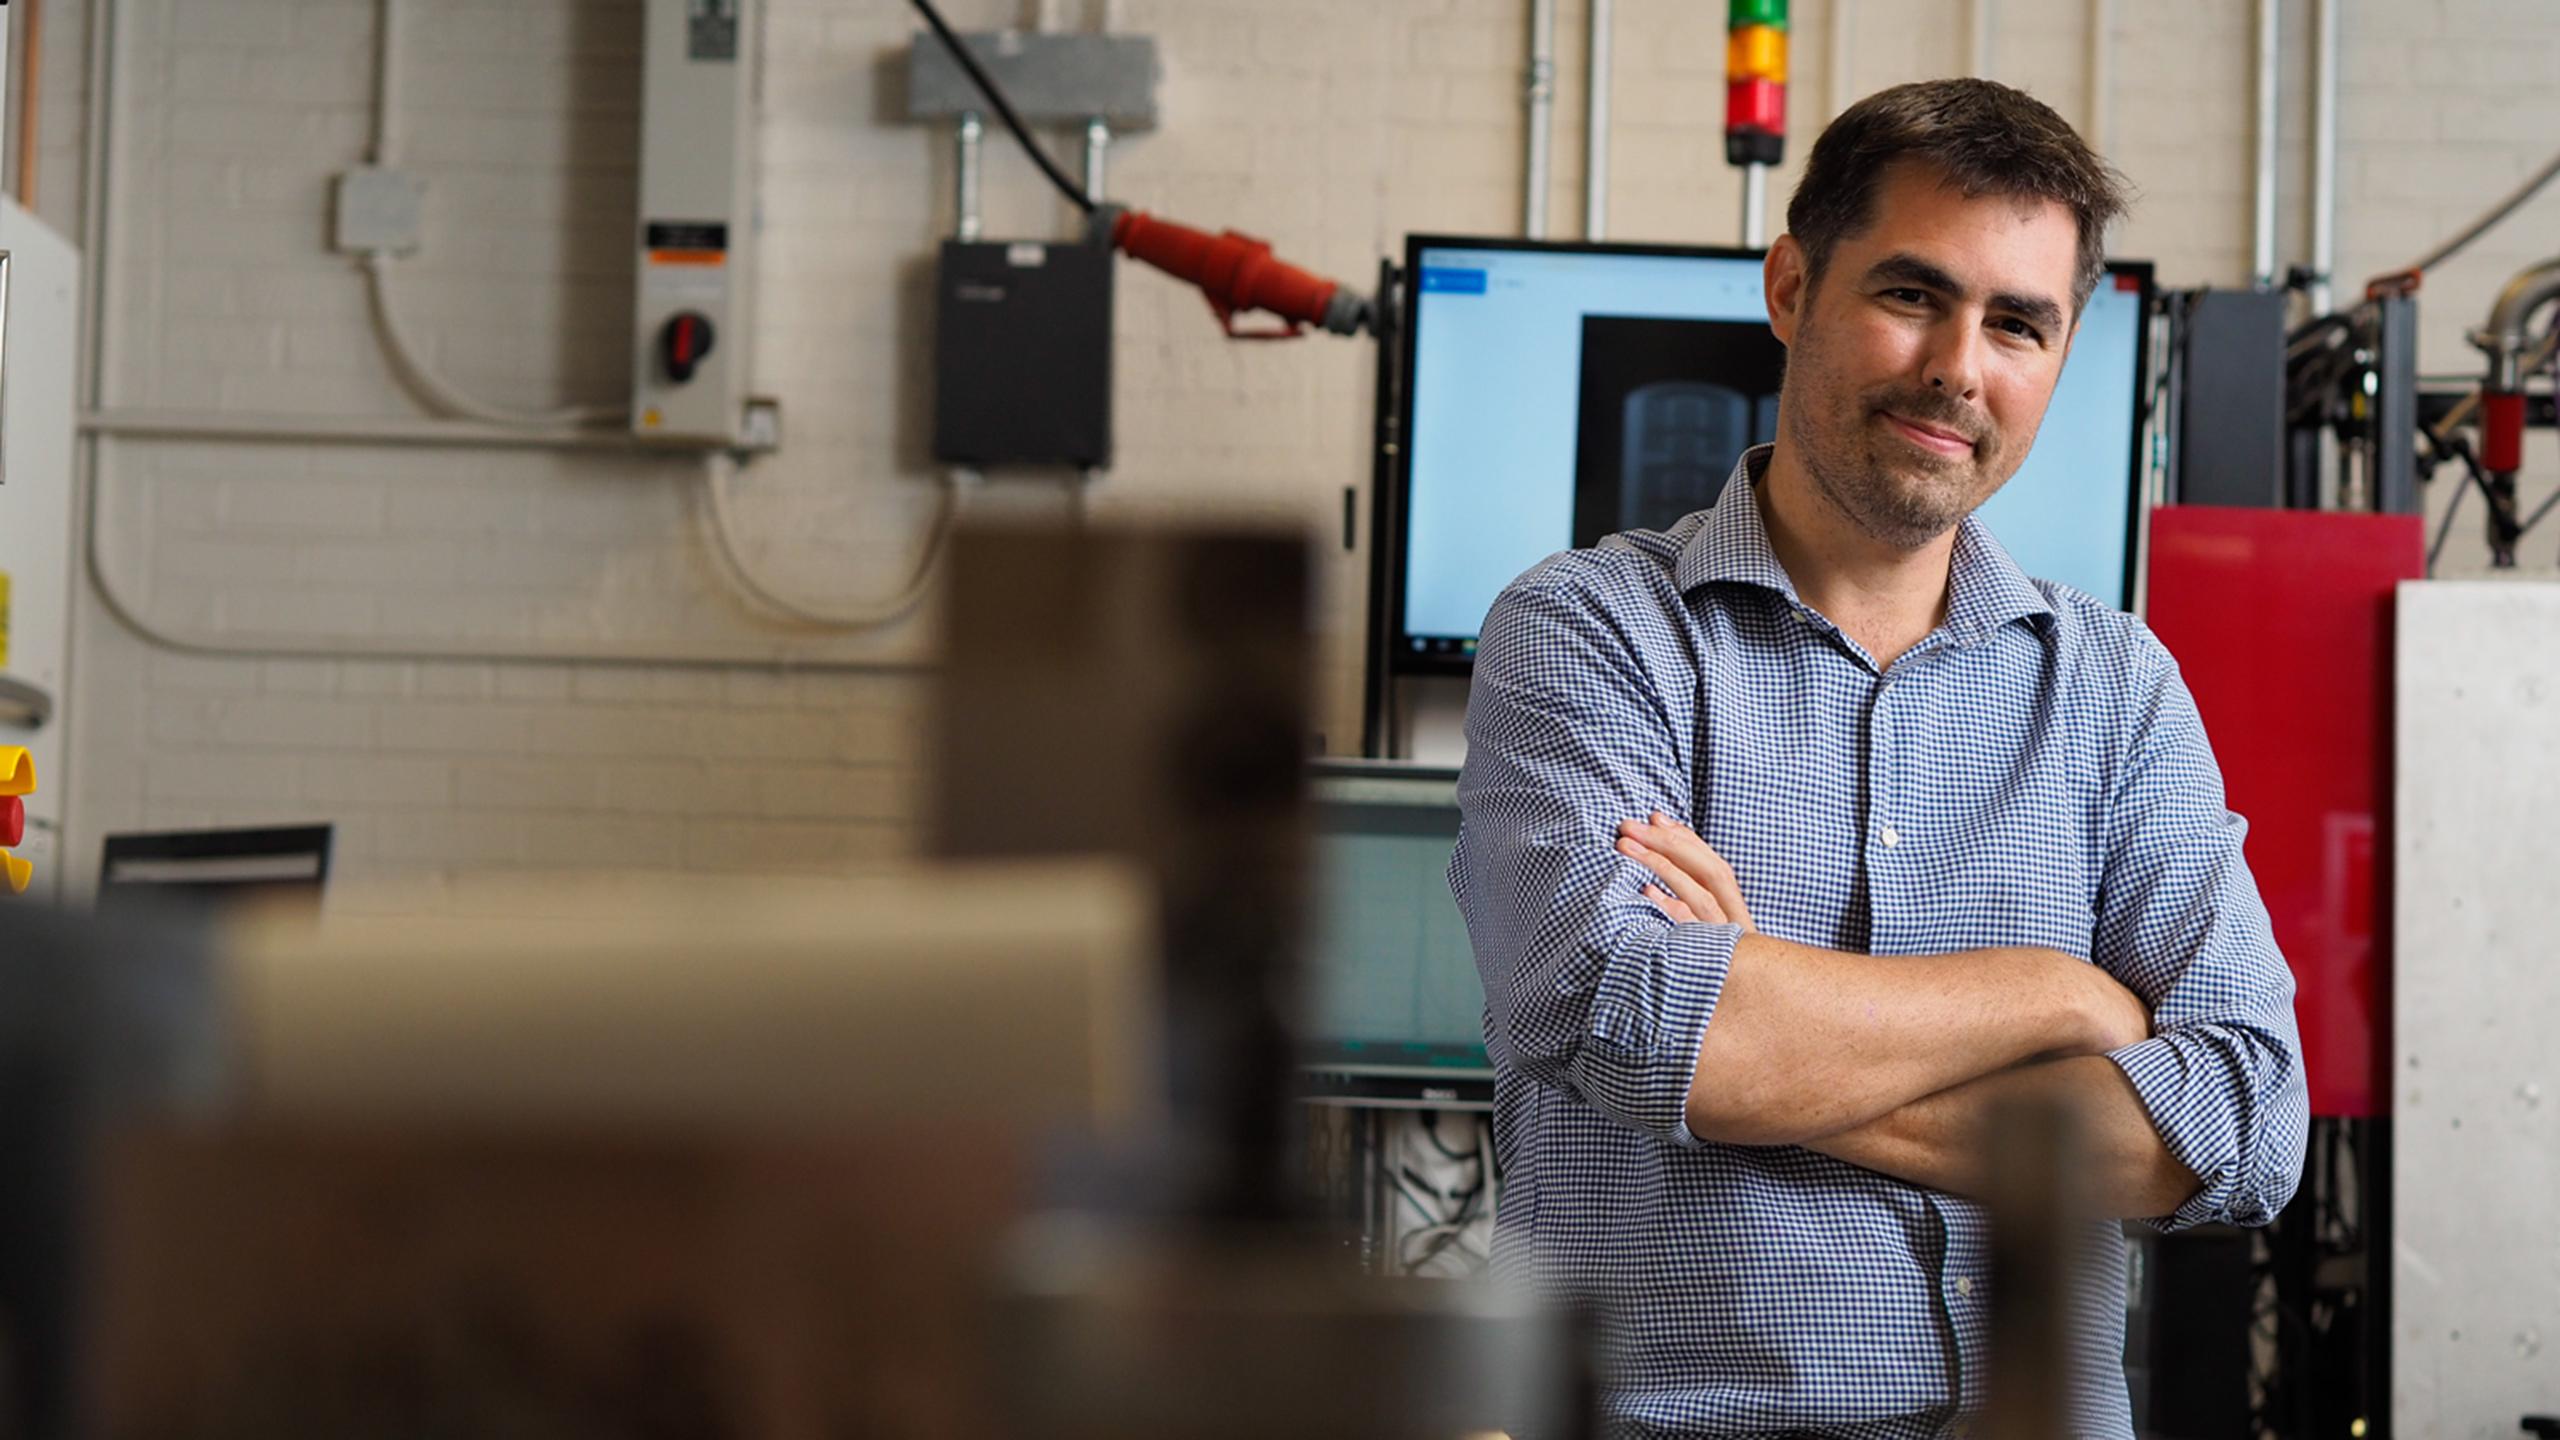 Inside NC State's Leading-Edge 3D Printing Hub